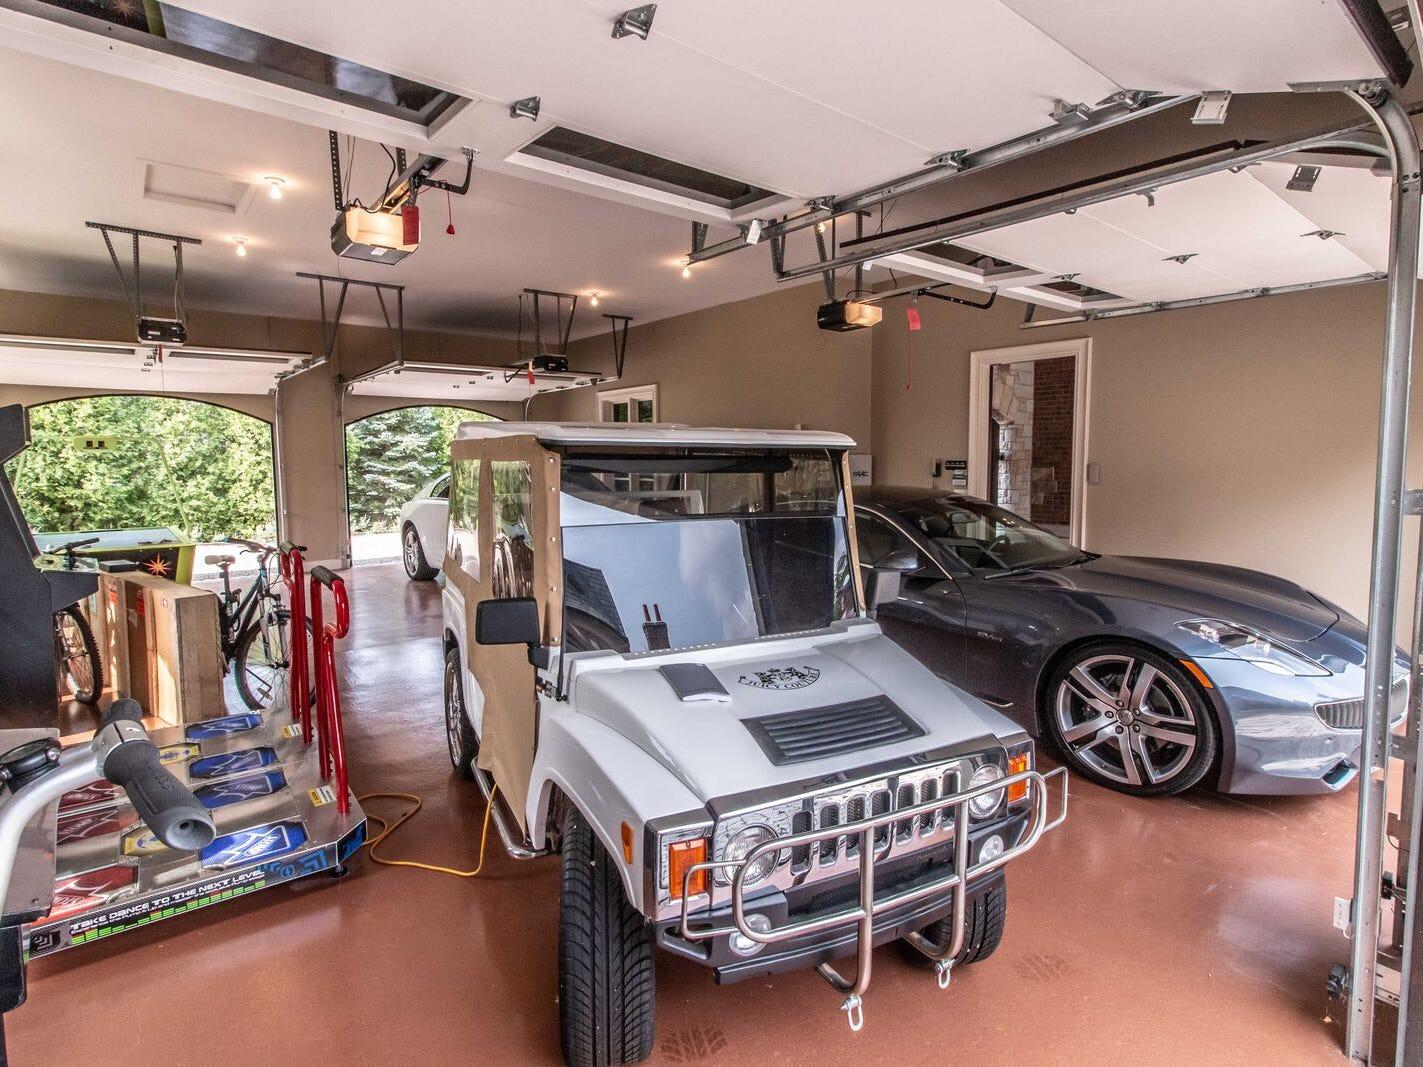 Inside the eight-car garage.